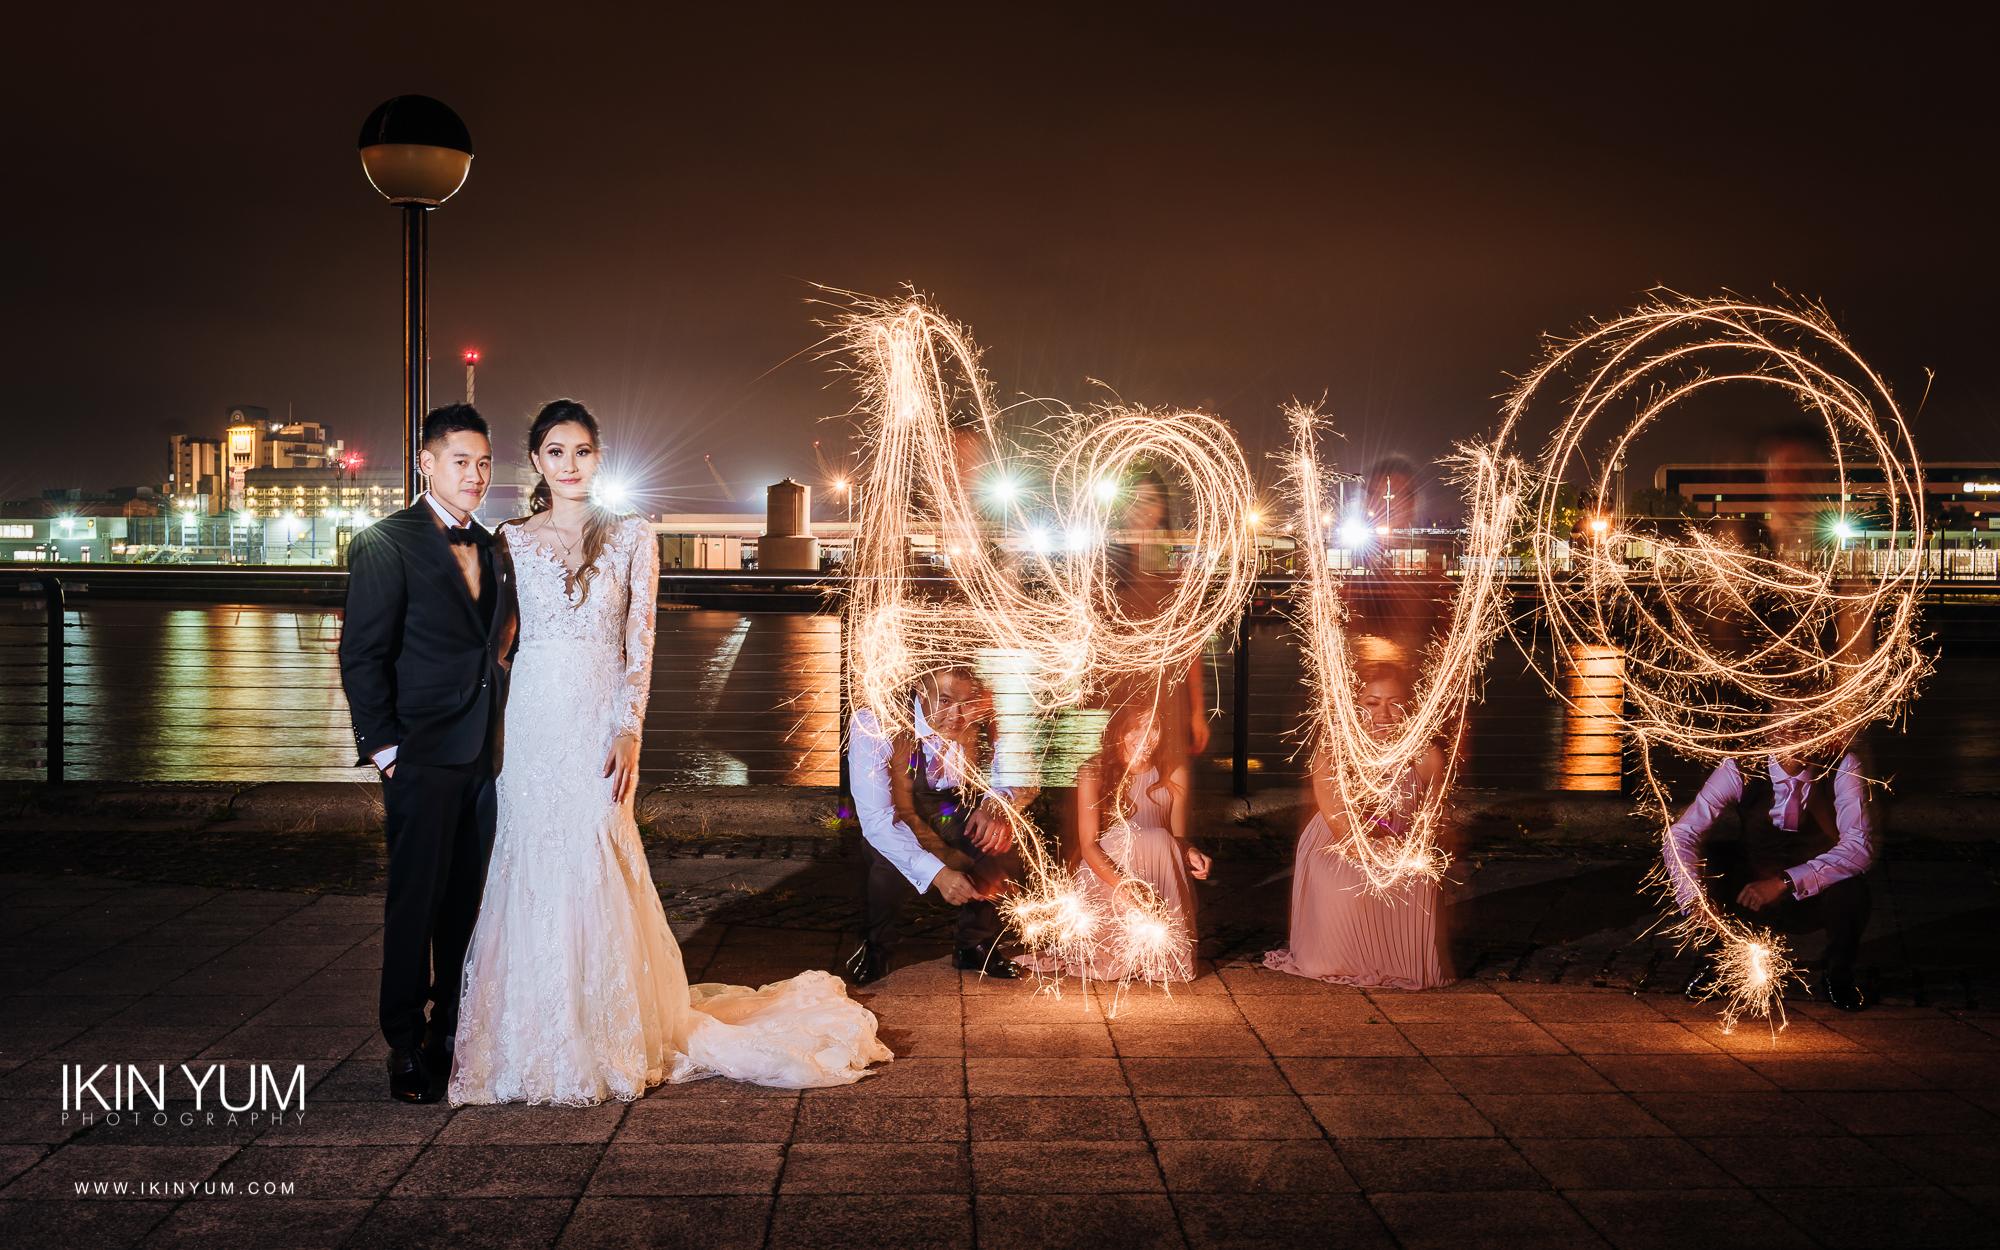 Syon Park Wedding photography Mimi & Minh-158.jpg